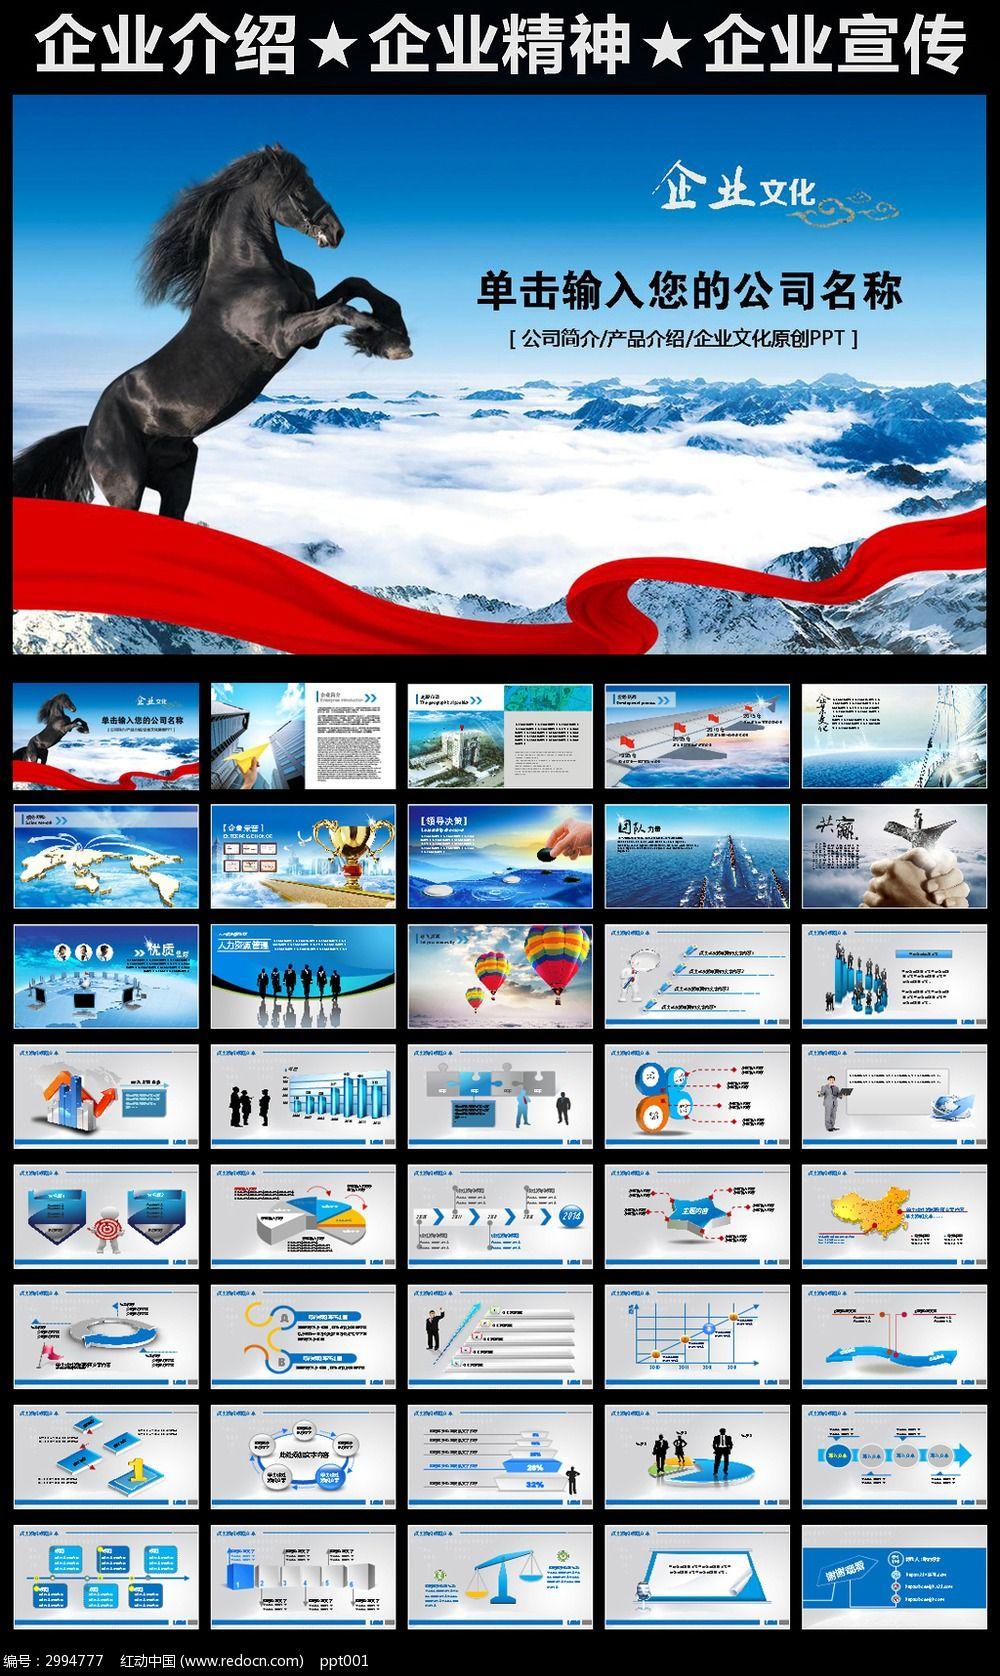 PPT 模板 模版 背景 图表 动态 会议 报告 座谈 交流 研讨 表彰 新年计